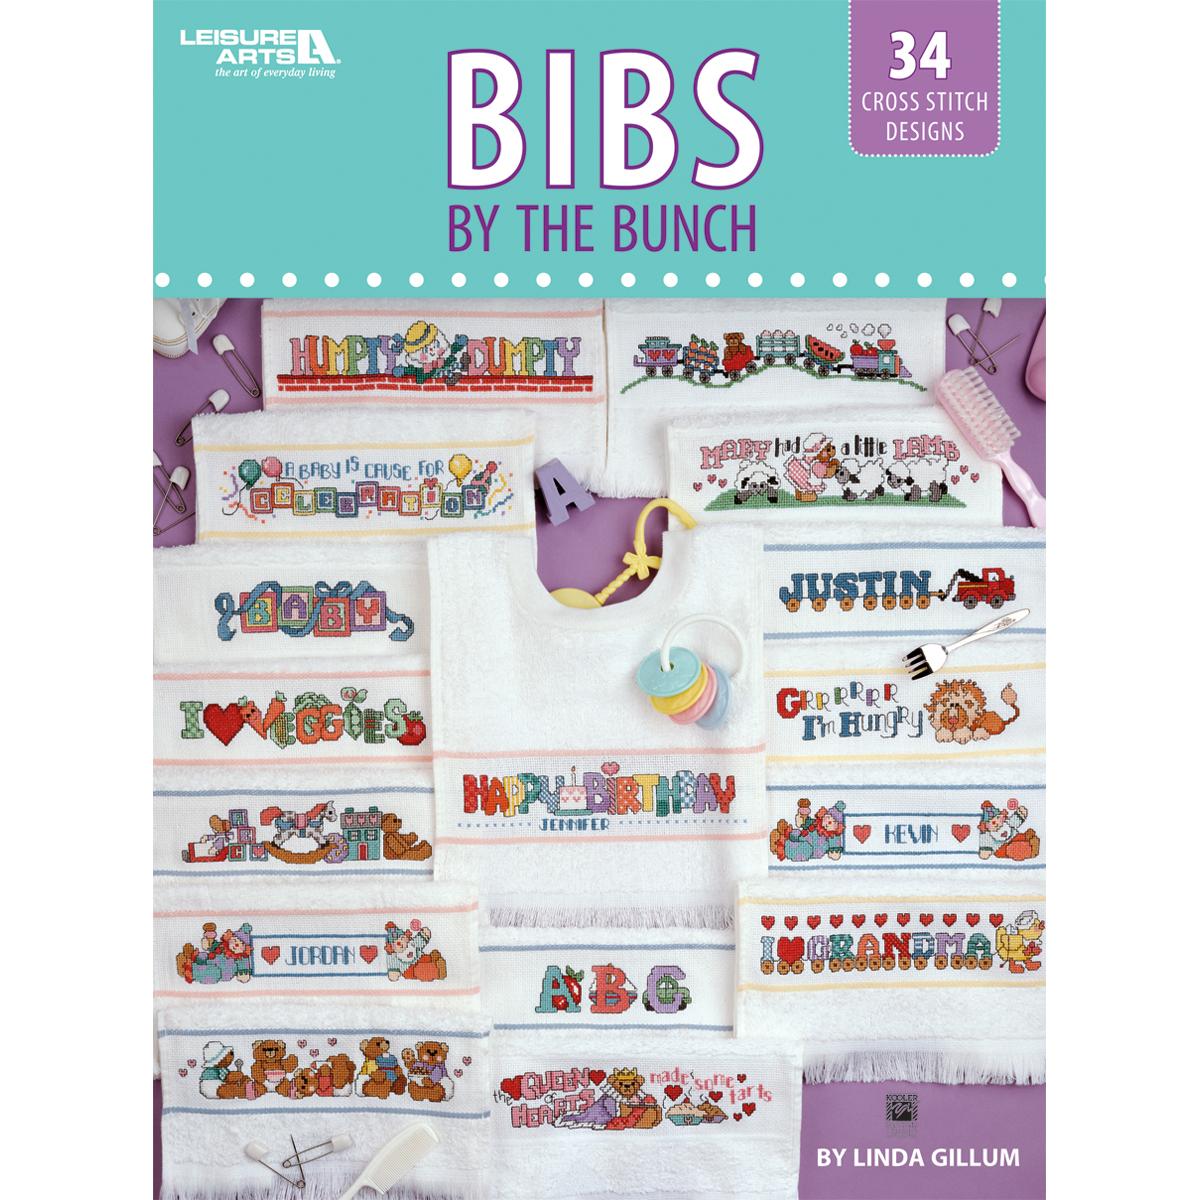 Bibs by the Bunch Cross Stitch